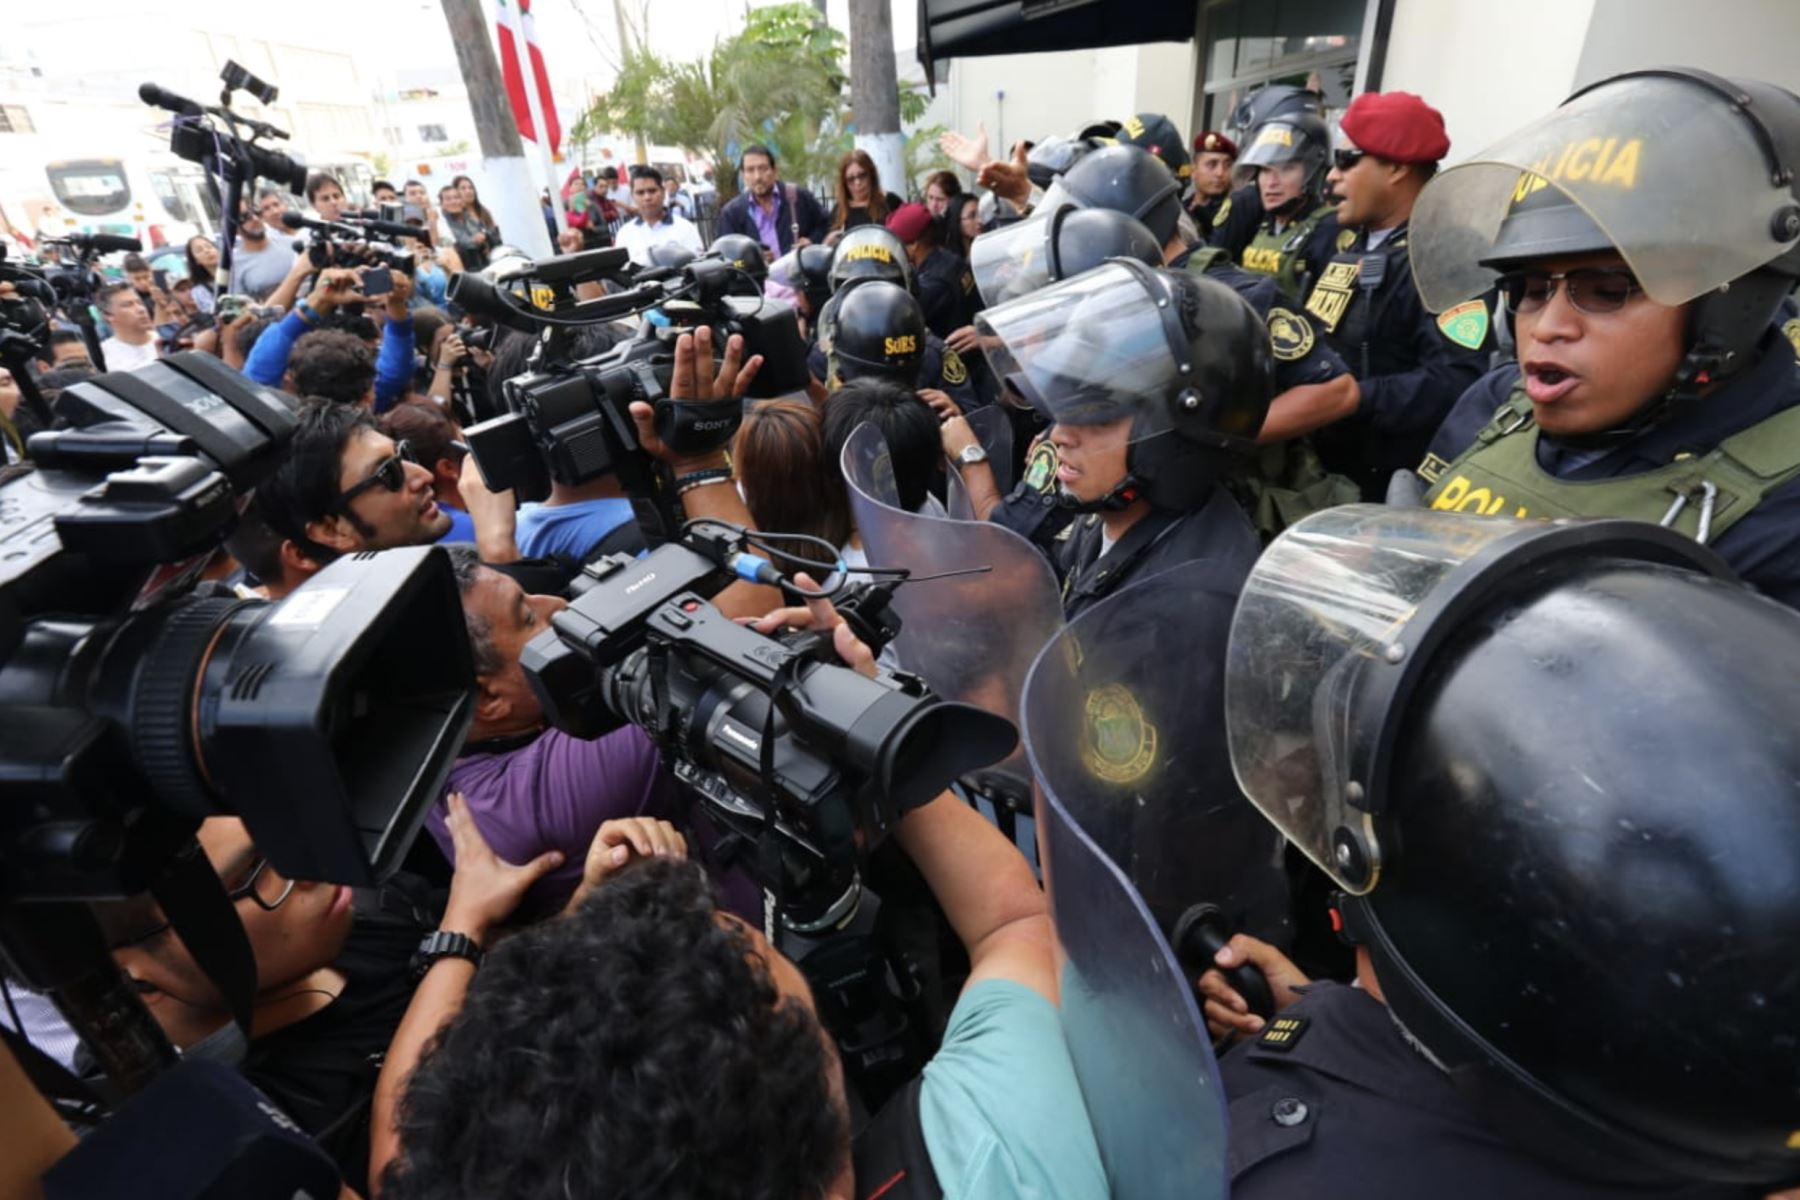 Exteriores del hospital Casimiro Ulloa, donde fue internado de emergencia el expresidente Alan García. Foto: ANDINA/ Norman Córdova